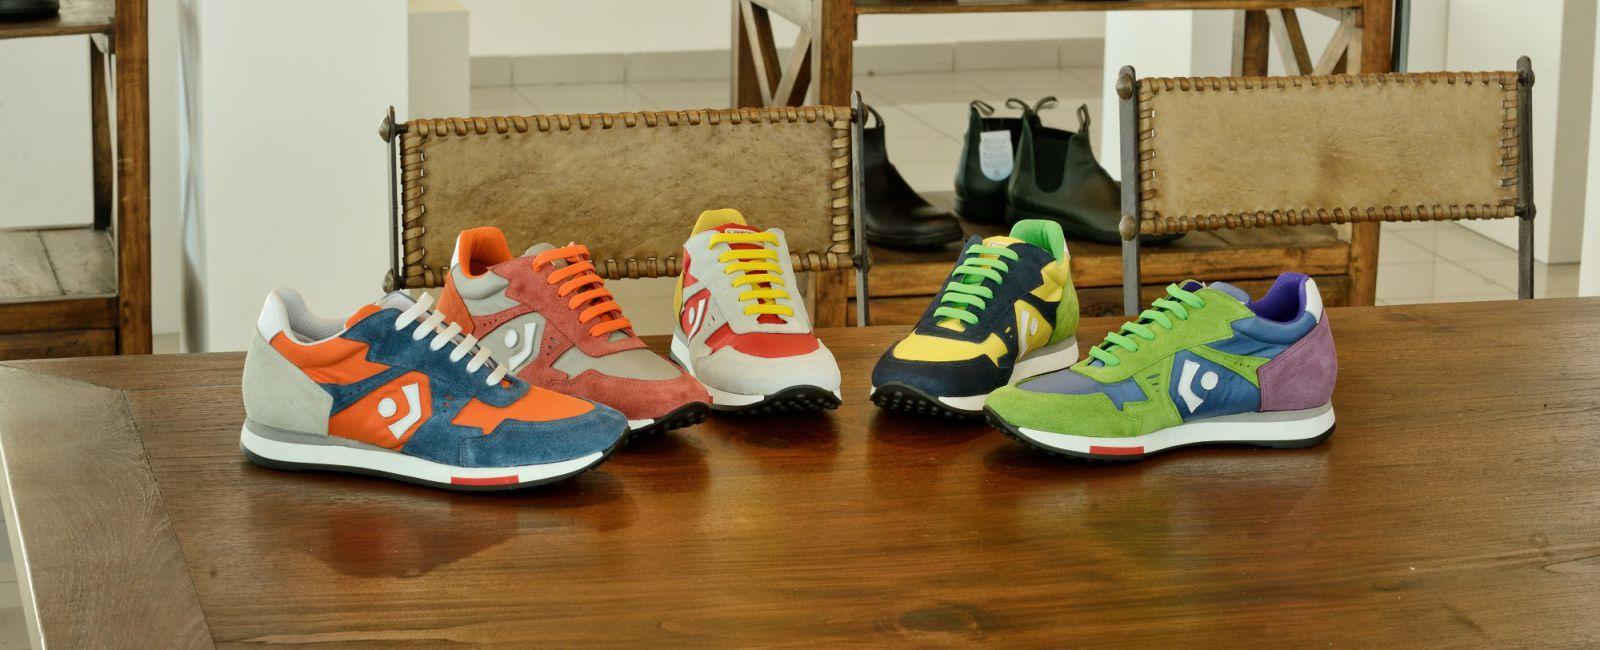 Trackstone original brand, scarpe beatles,sneackers, running